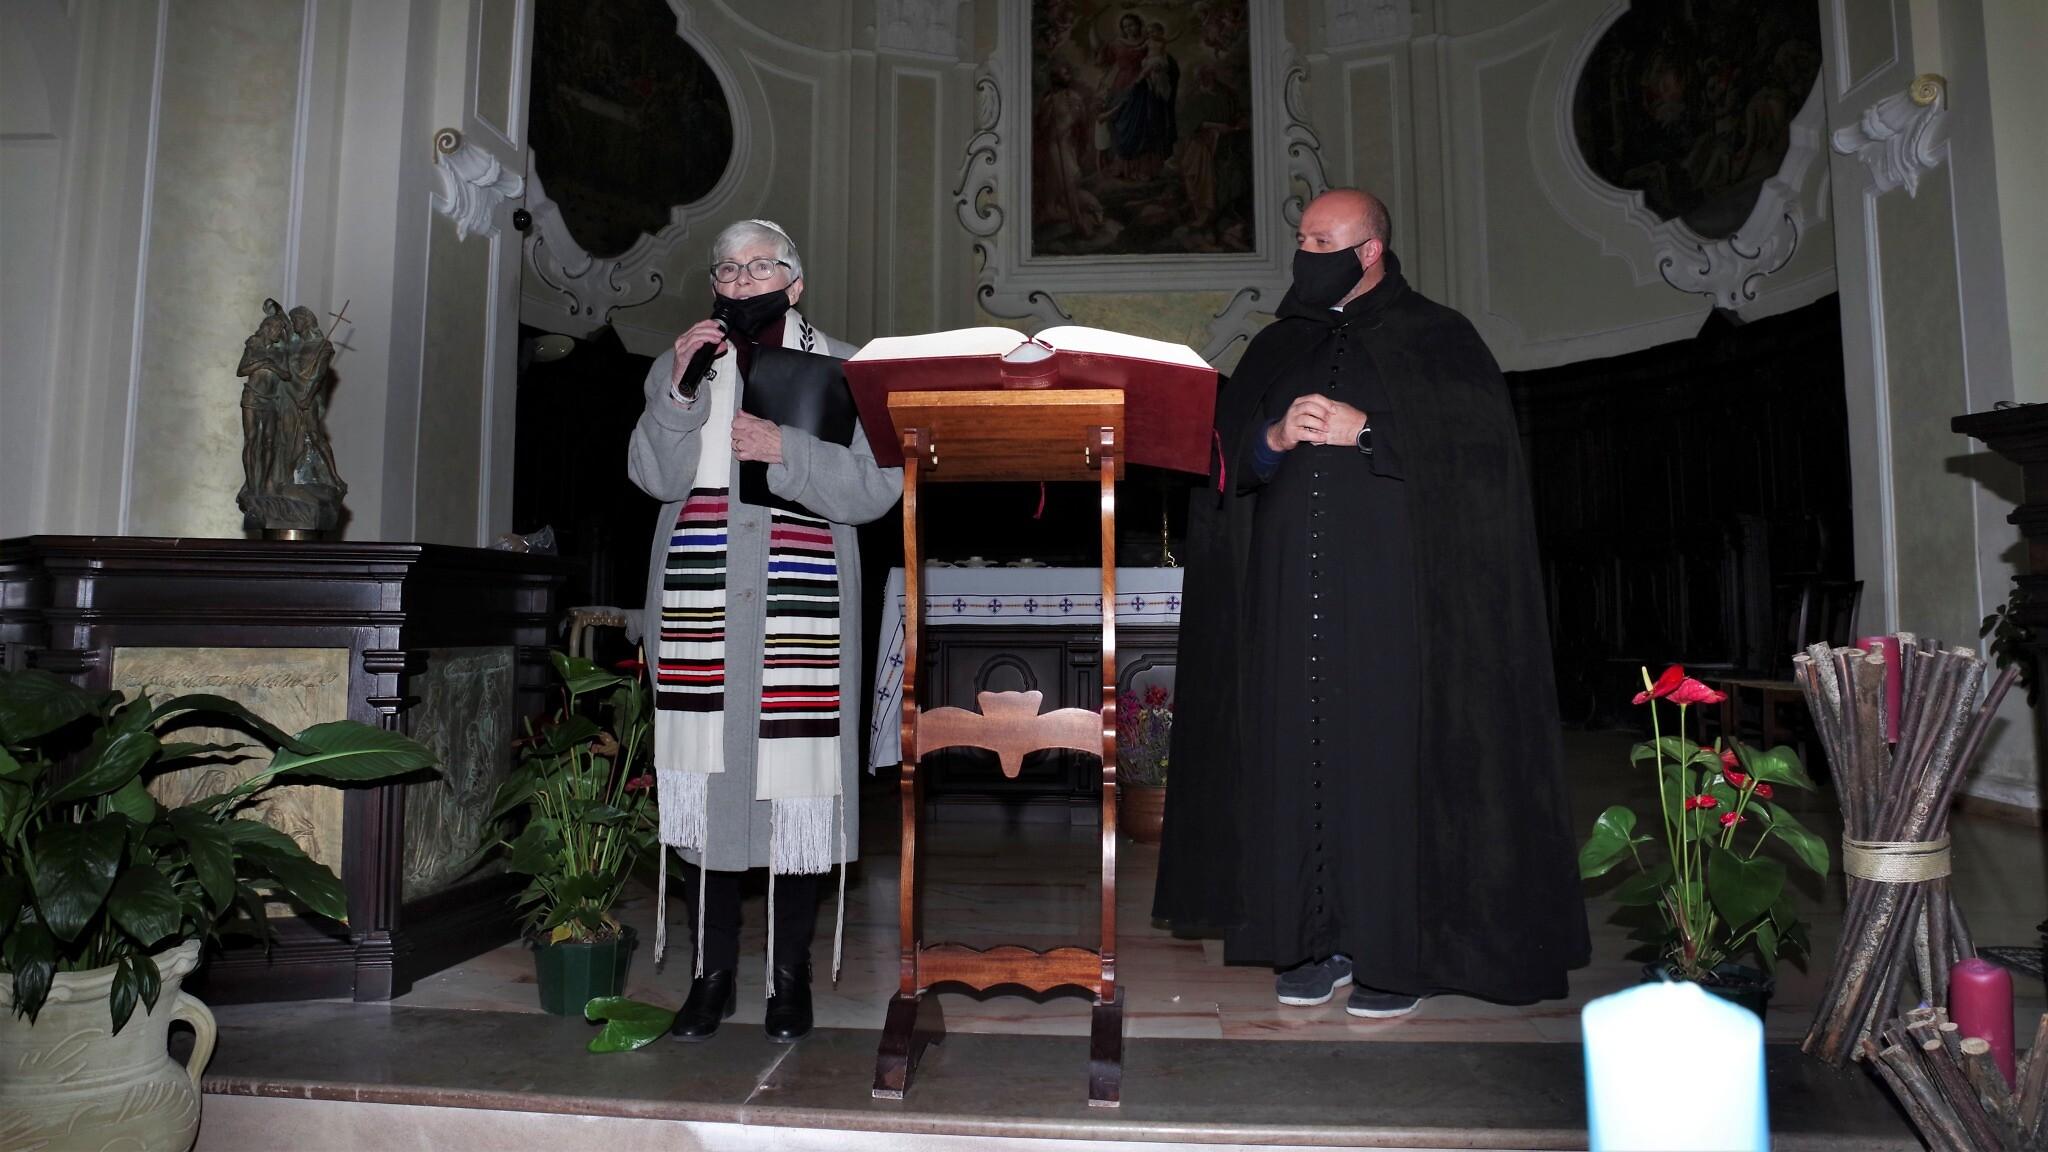 Rabbi Barbara Aiello, left, and Don Antonio Costantino during the 2020 Chanukah celebration. Photo by Domenico Pulice, Italy